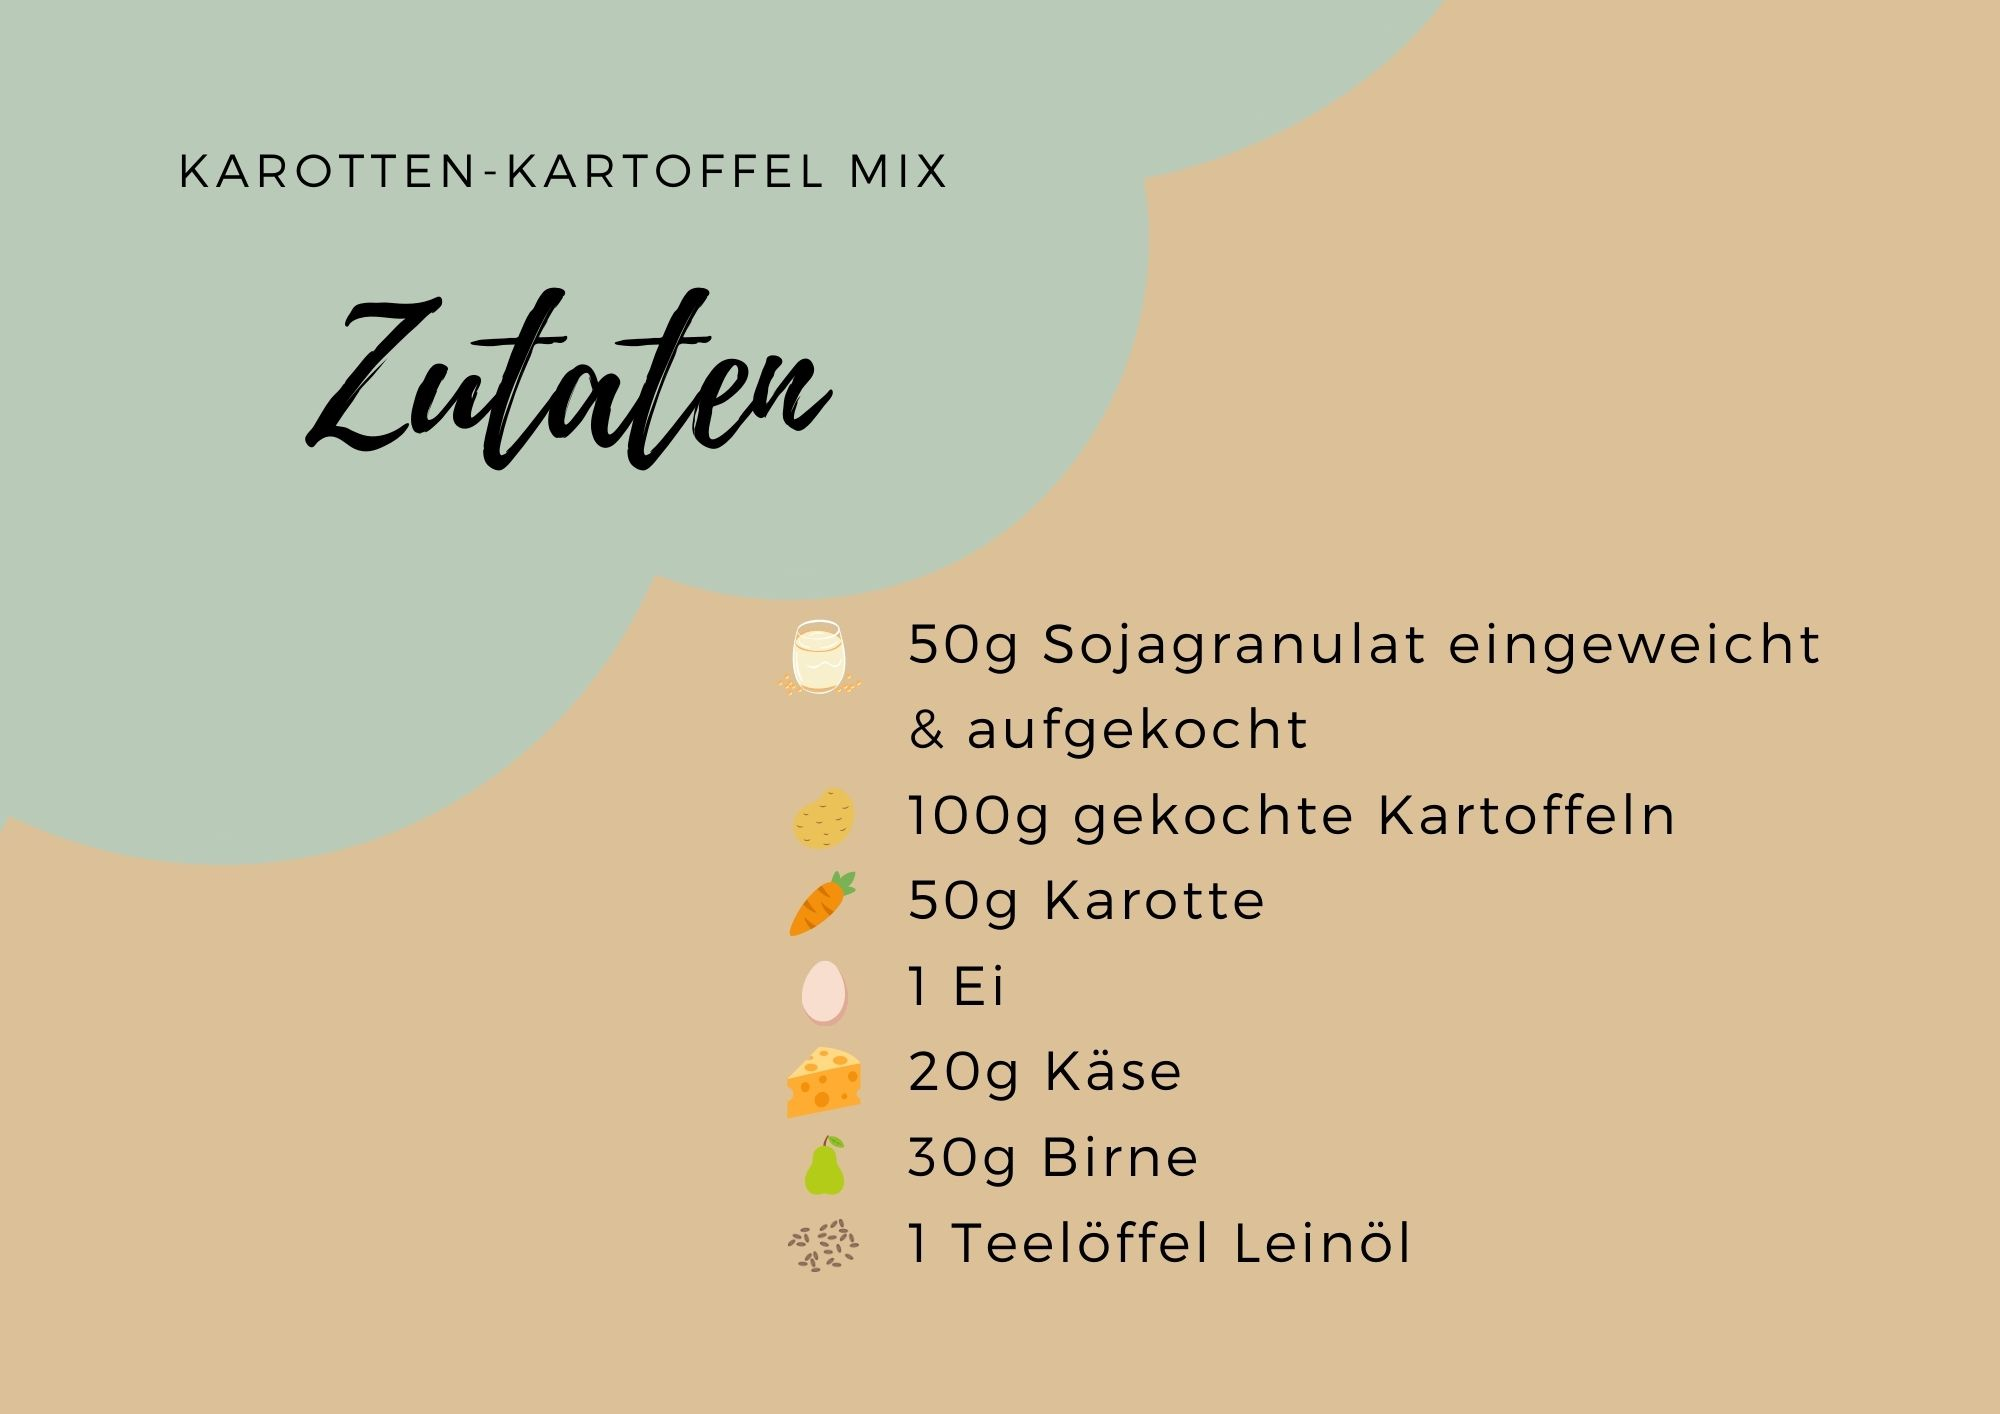 Karotten-Kartoffel mix